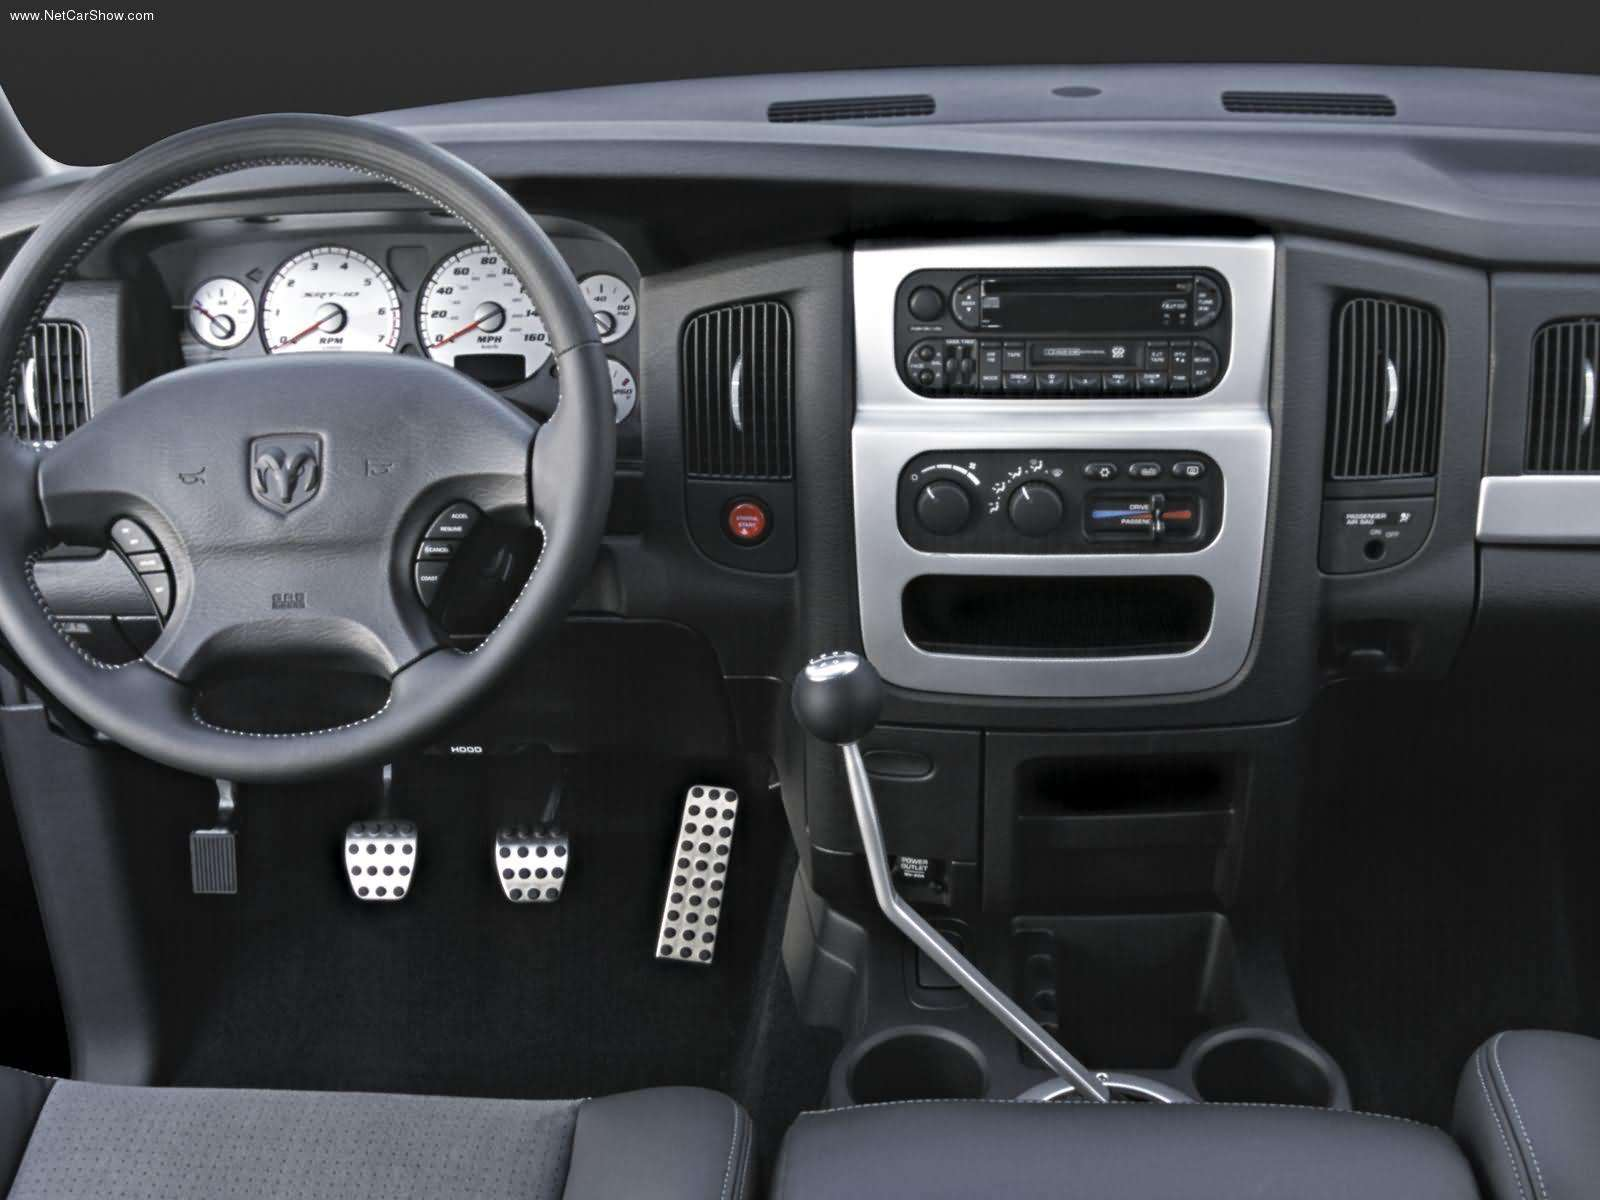 on 2006 Dodge Ram 1500 Dash